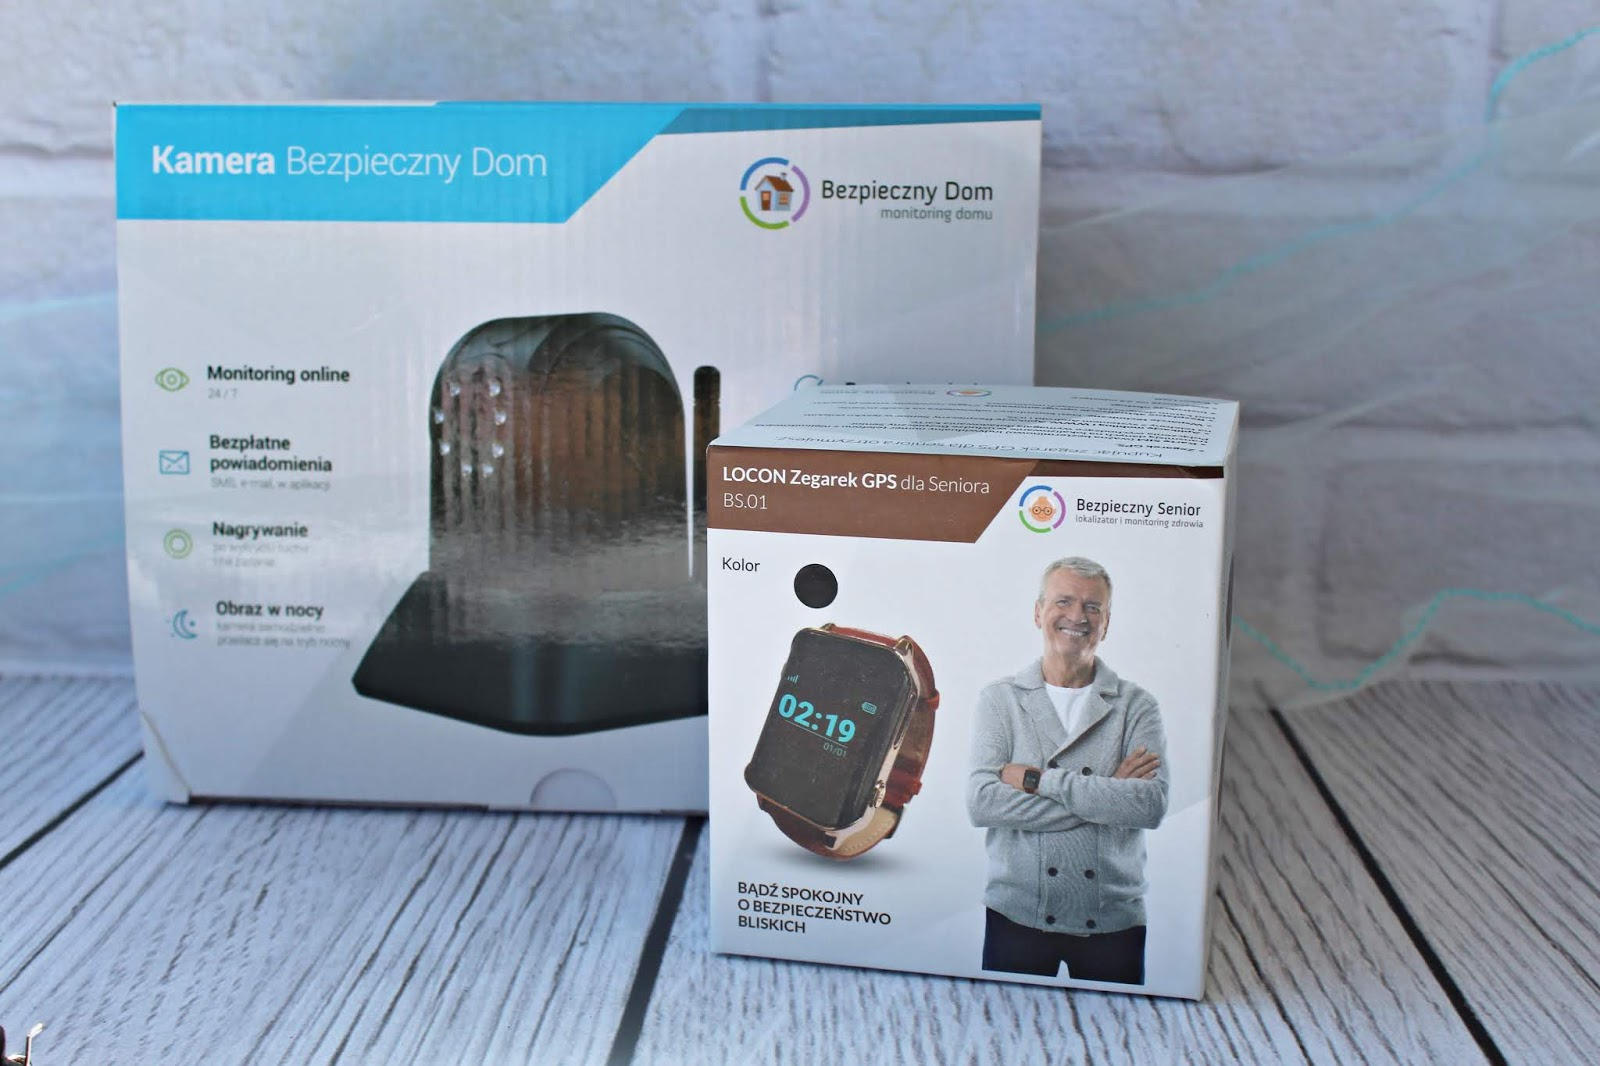 Lokalizator GPS dla seniora - Bezpieczny Senior + kamera do monitoringu domu